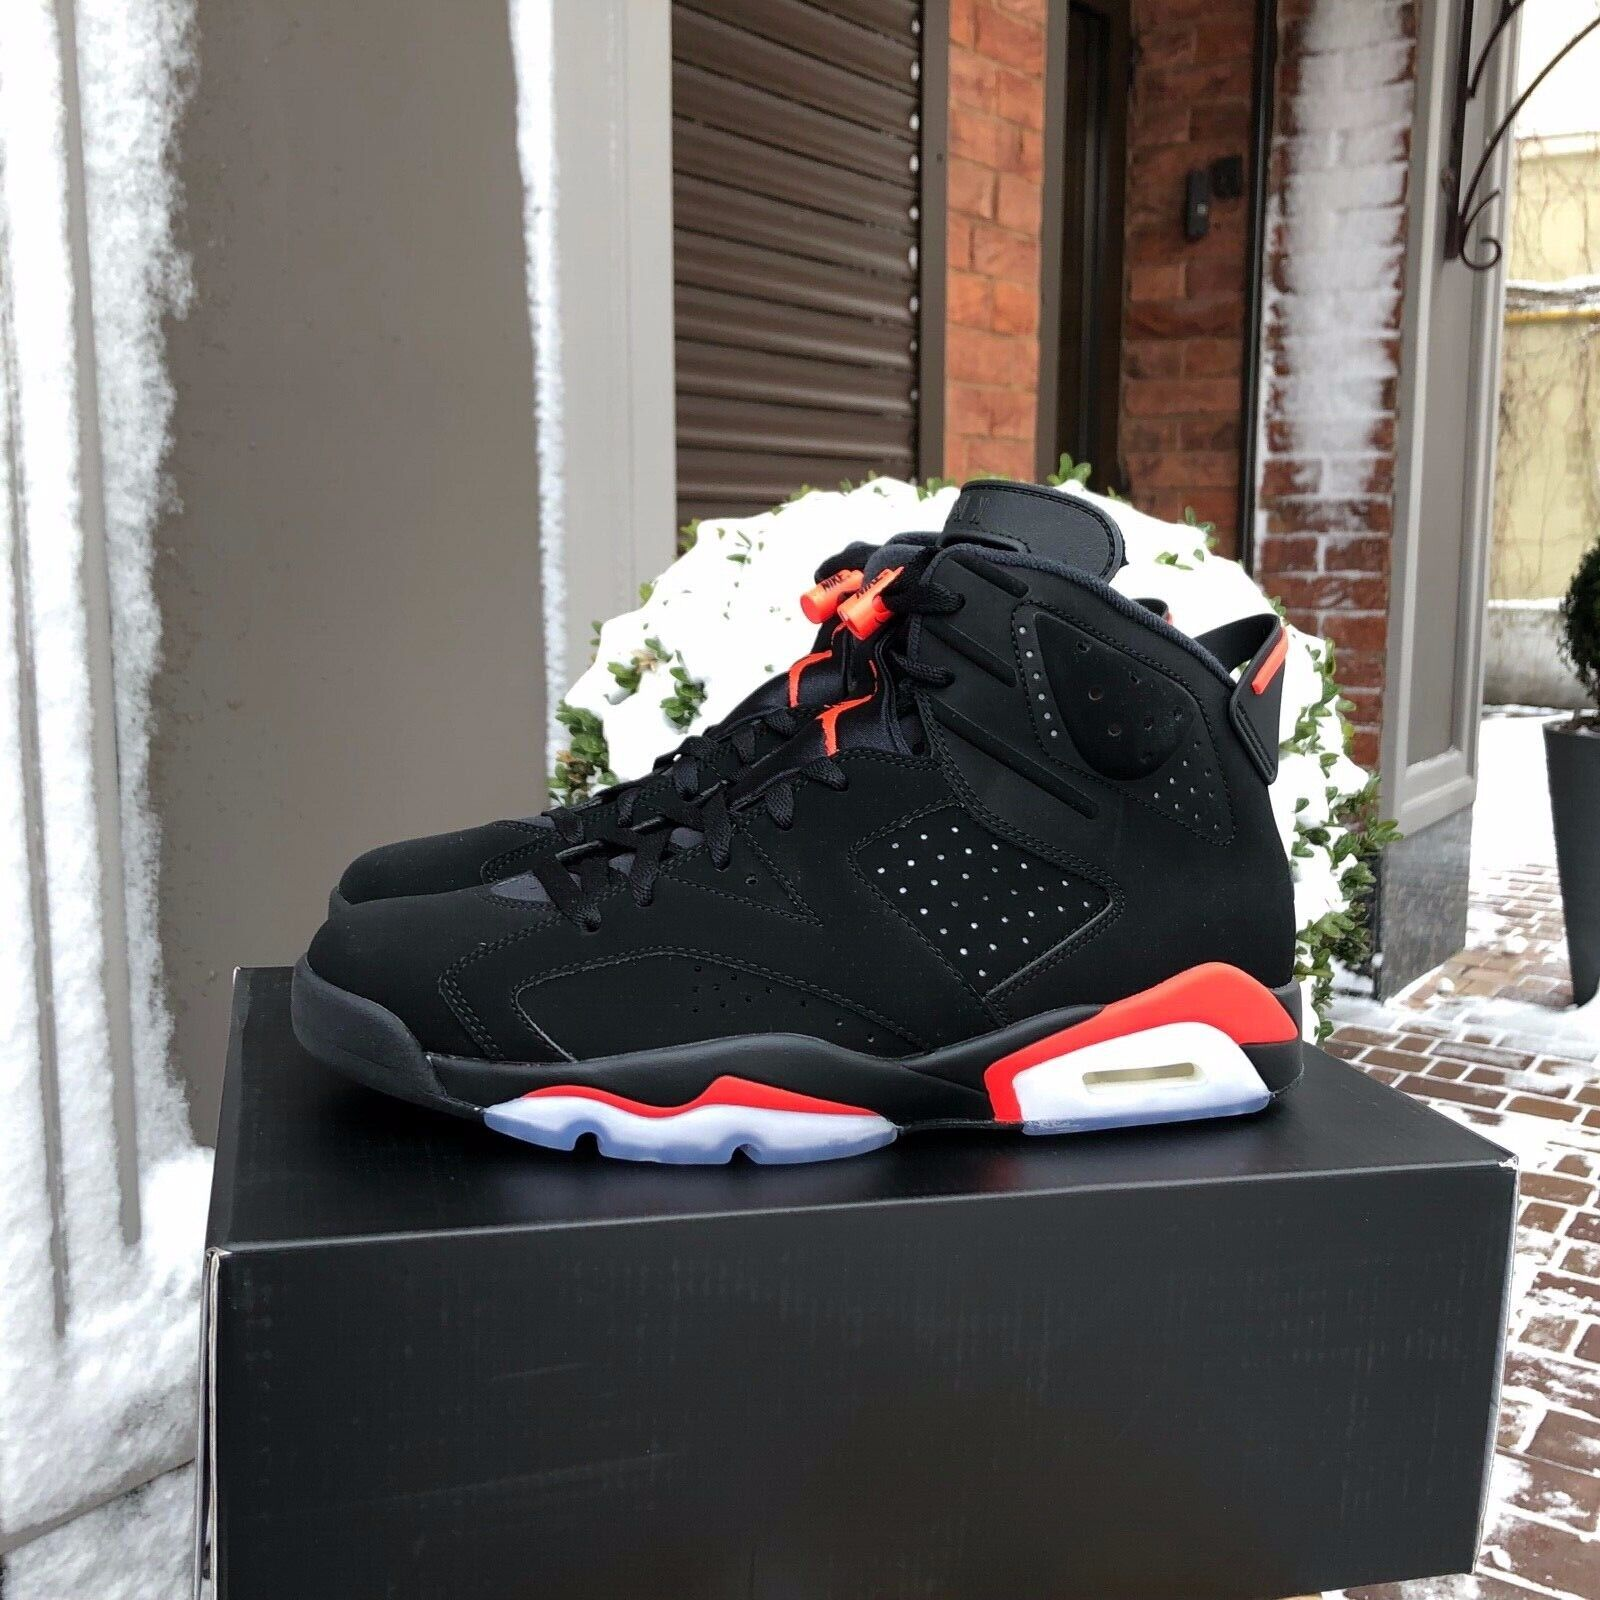 2019 Nike Nike Nike Air Jordan Retro 6 VI OG BLACK INFRARED Mens GS 384664-060 384665-060 caa005